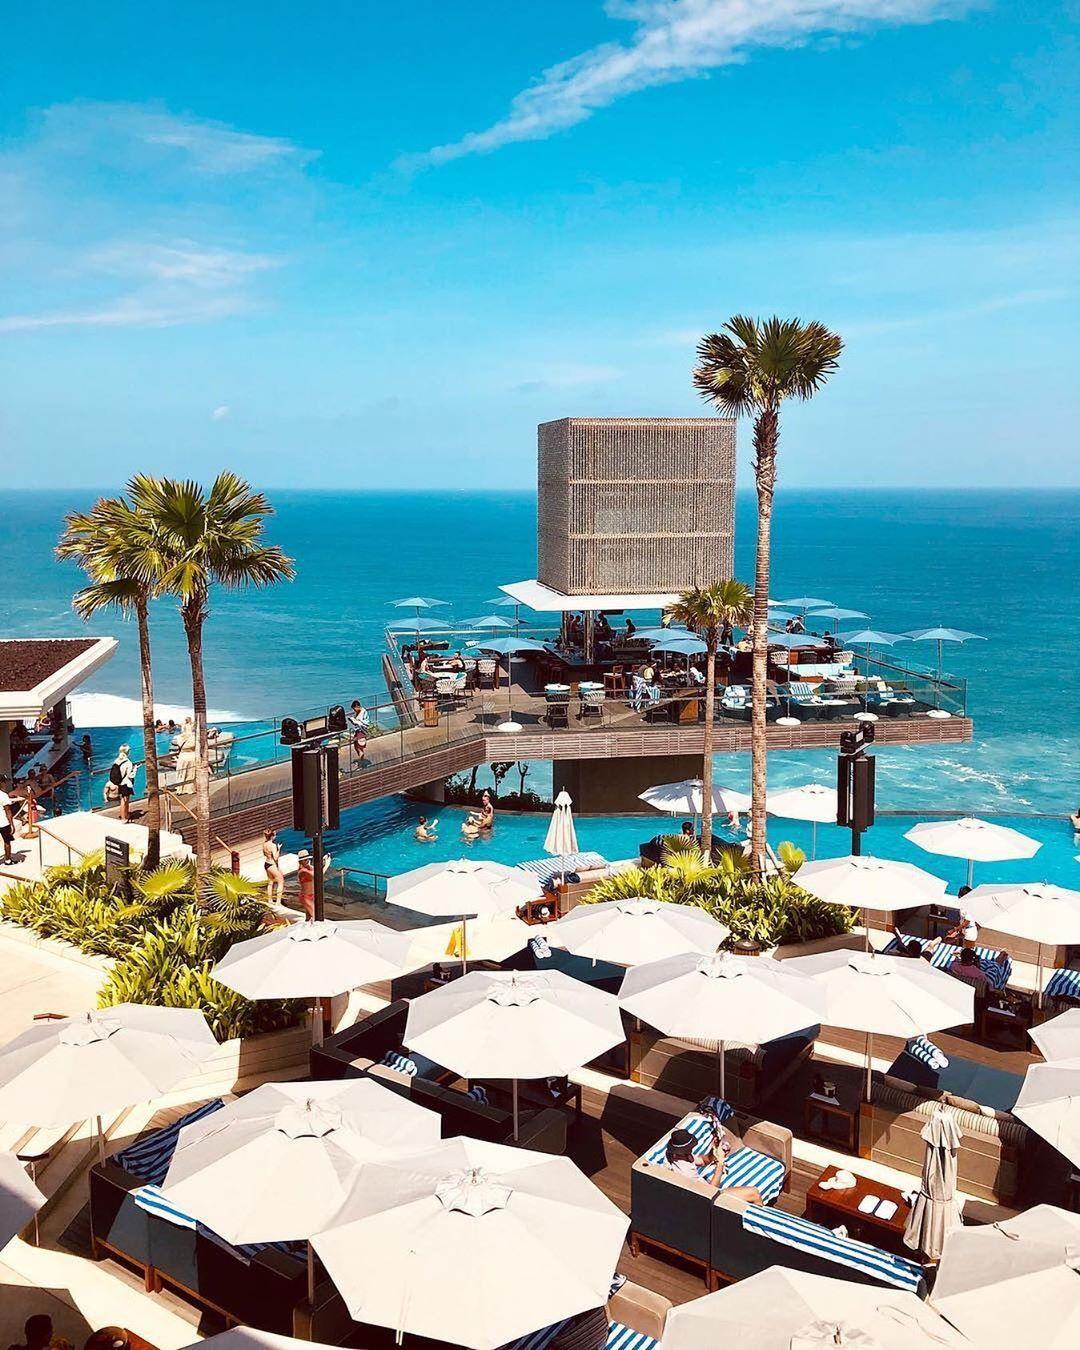 The Eight Best Beach Clubs In Bali, Indonesia | Bali ...